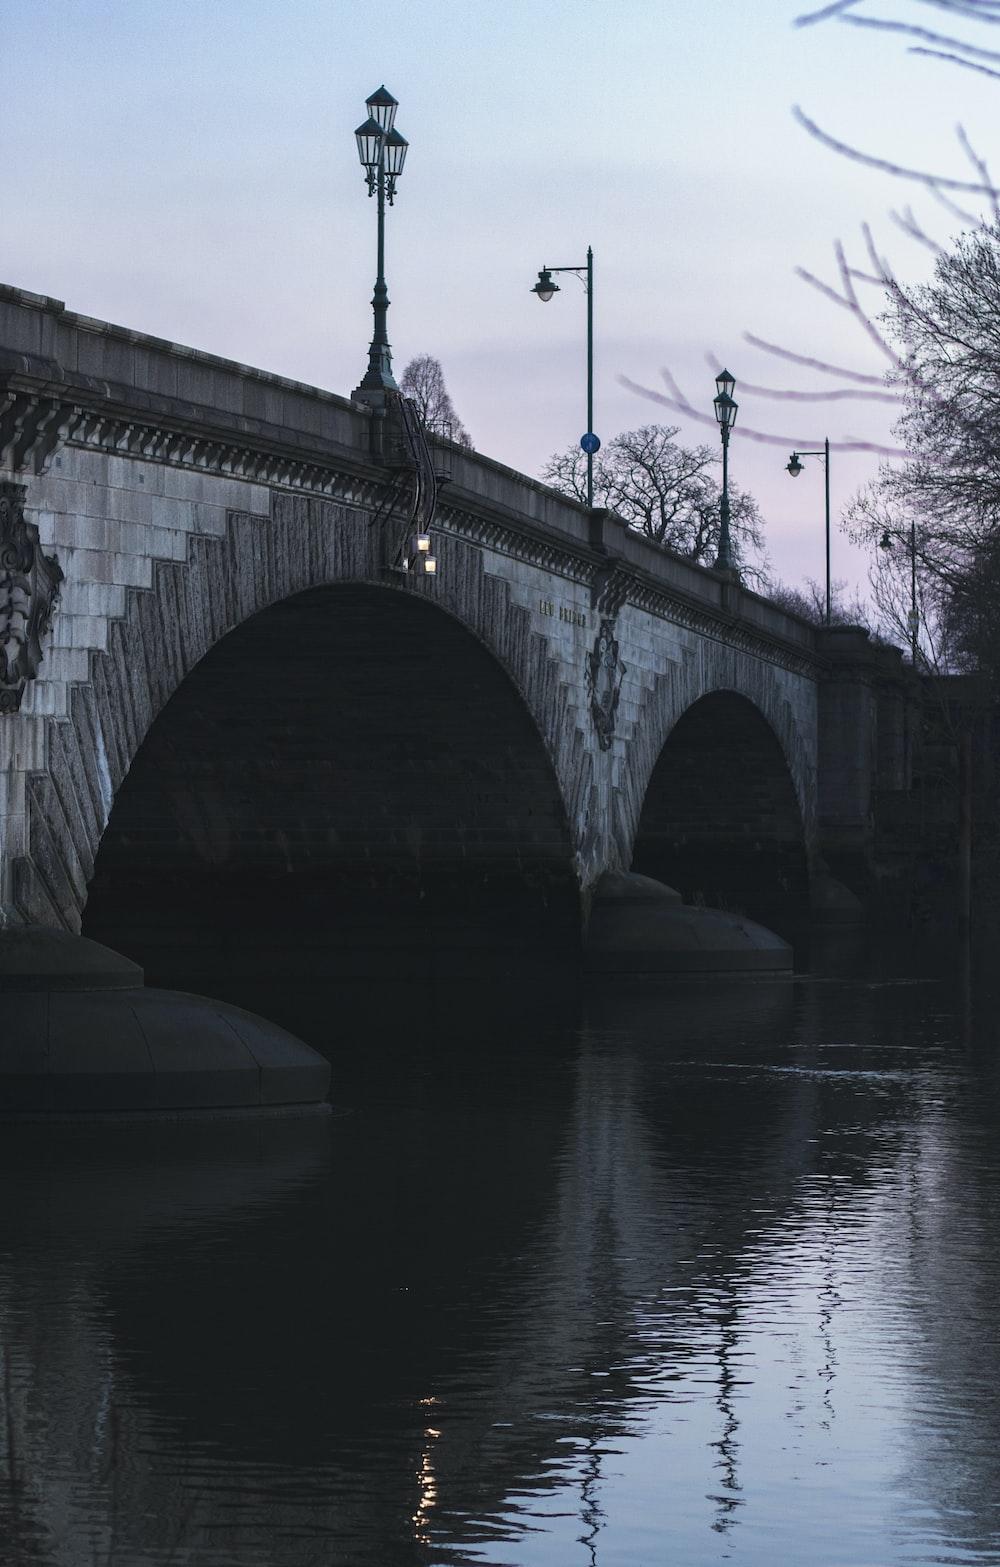 bridge over calm body of water under blue sky